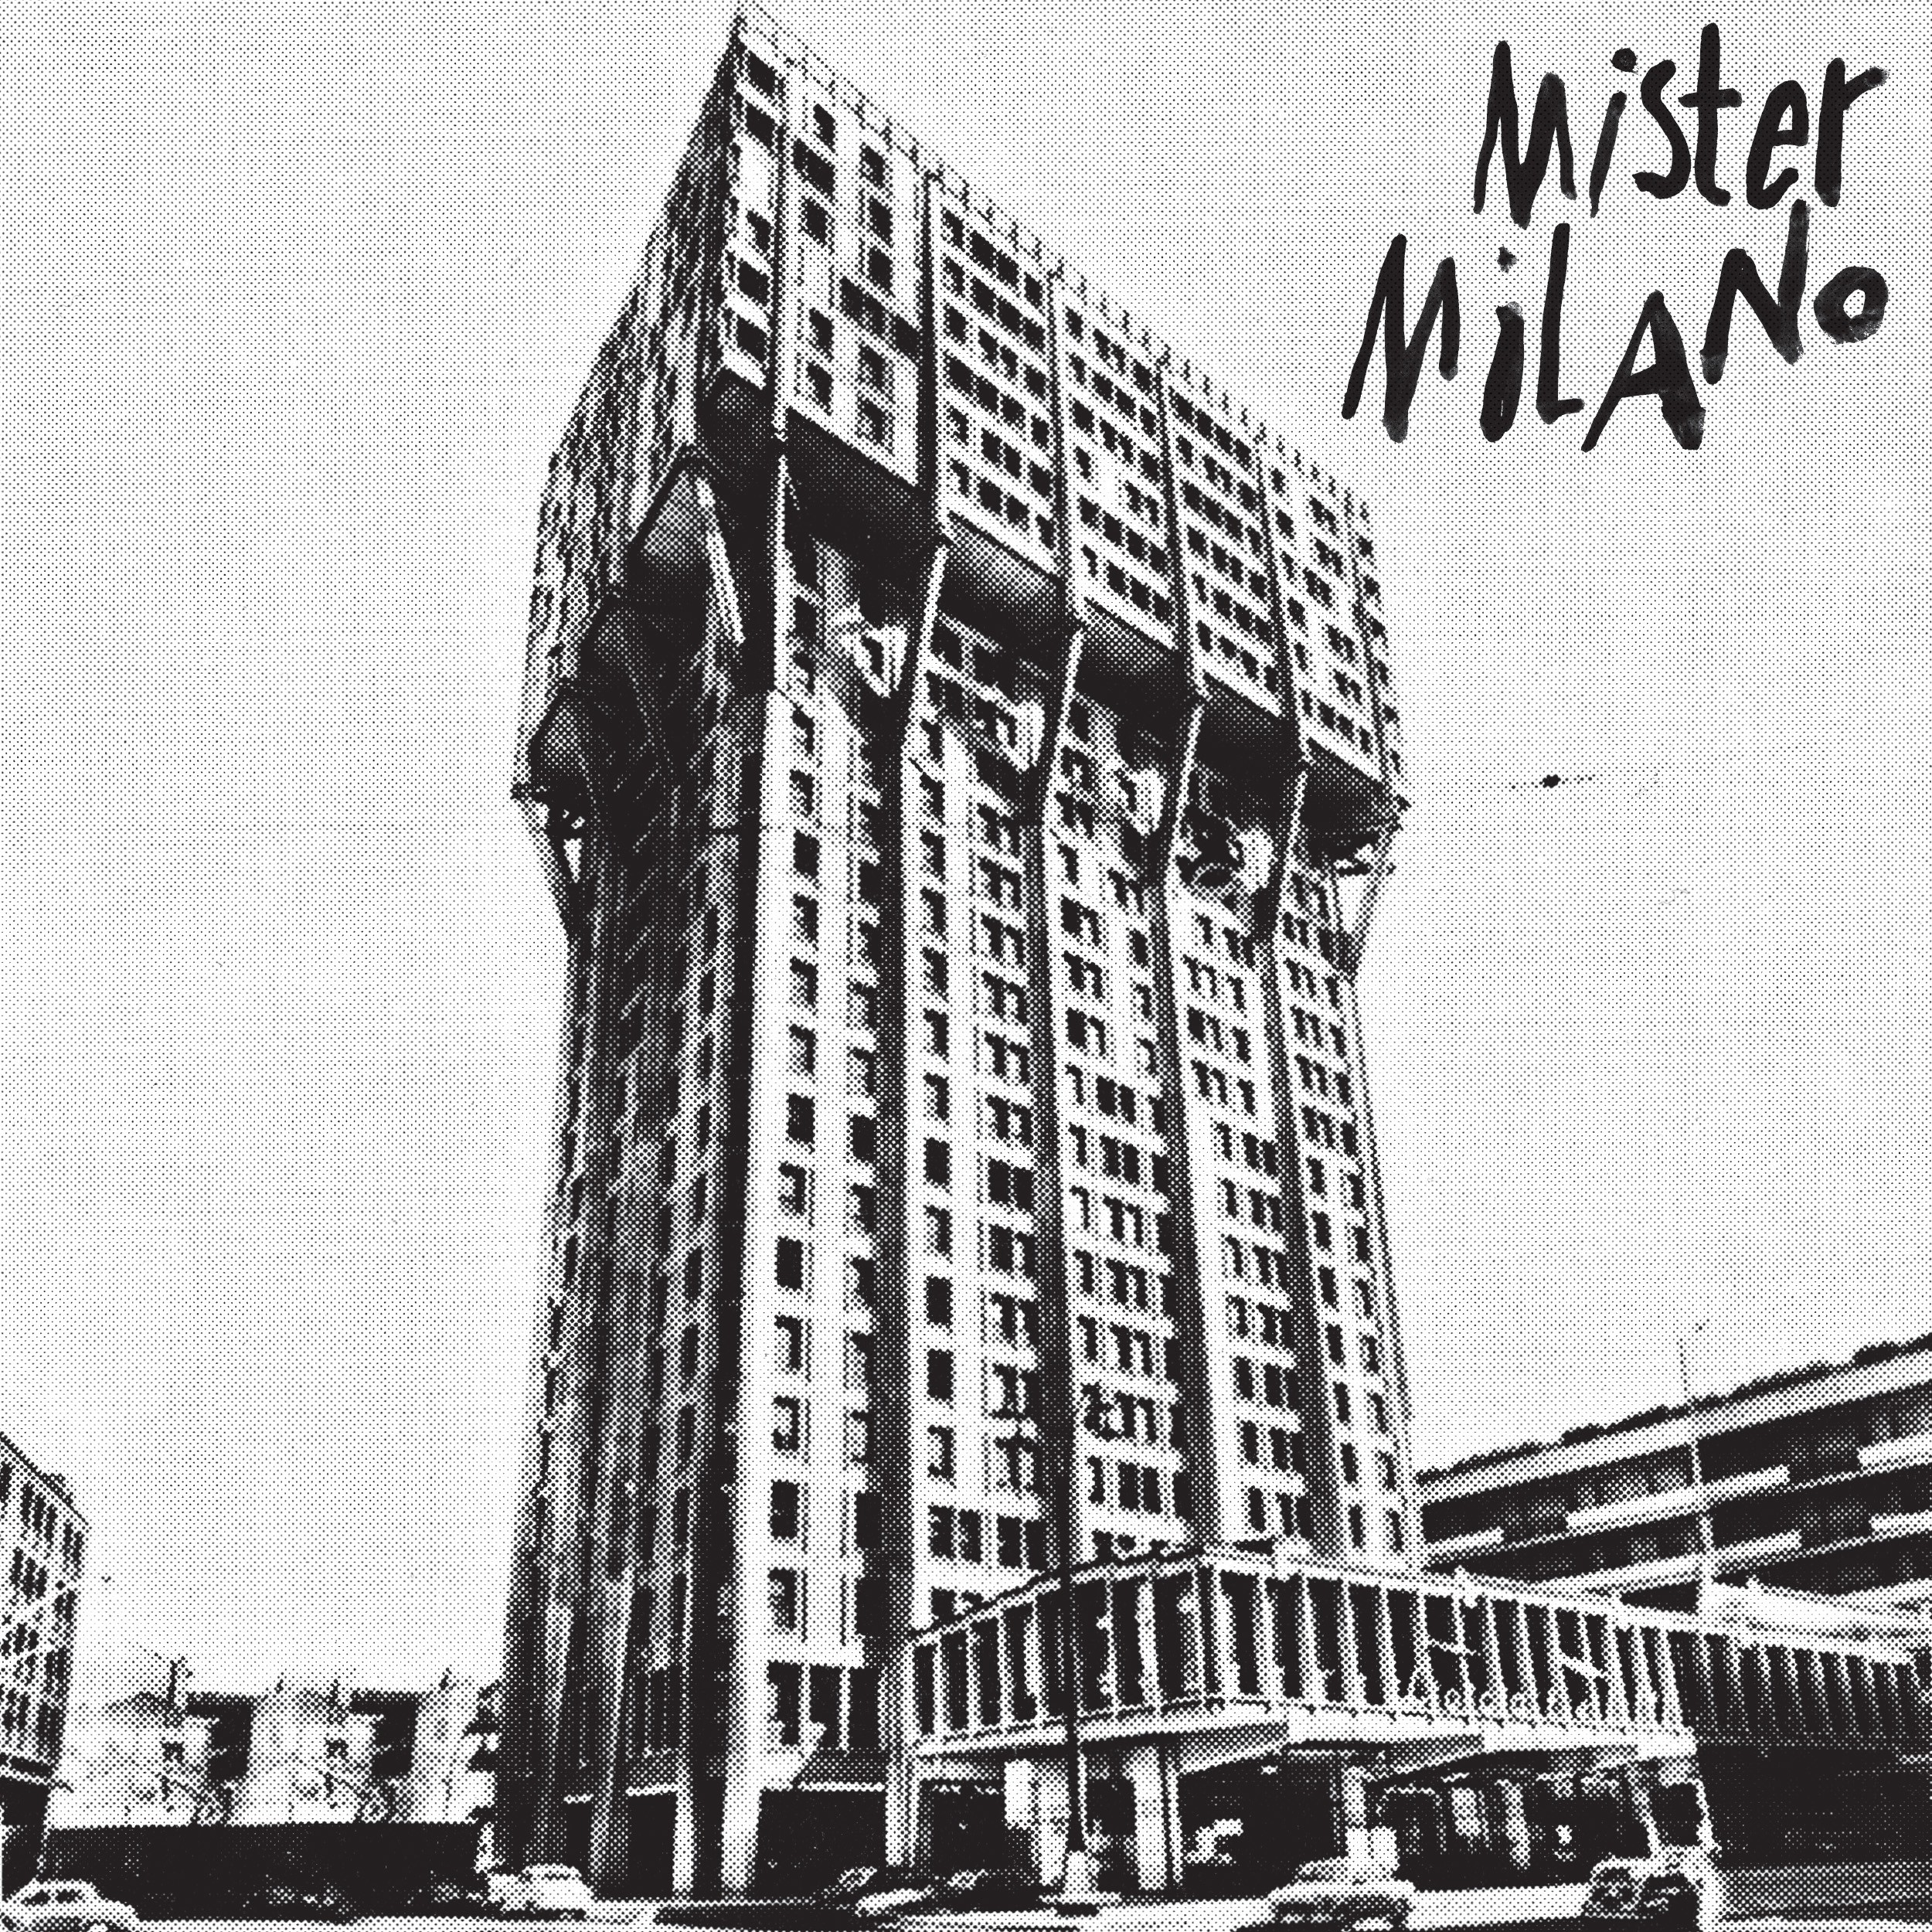 MISTER MILANO – Mister Milano